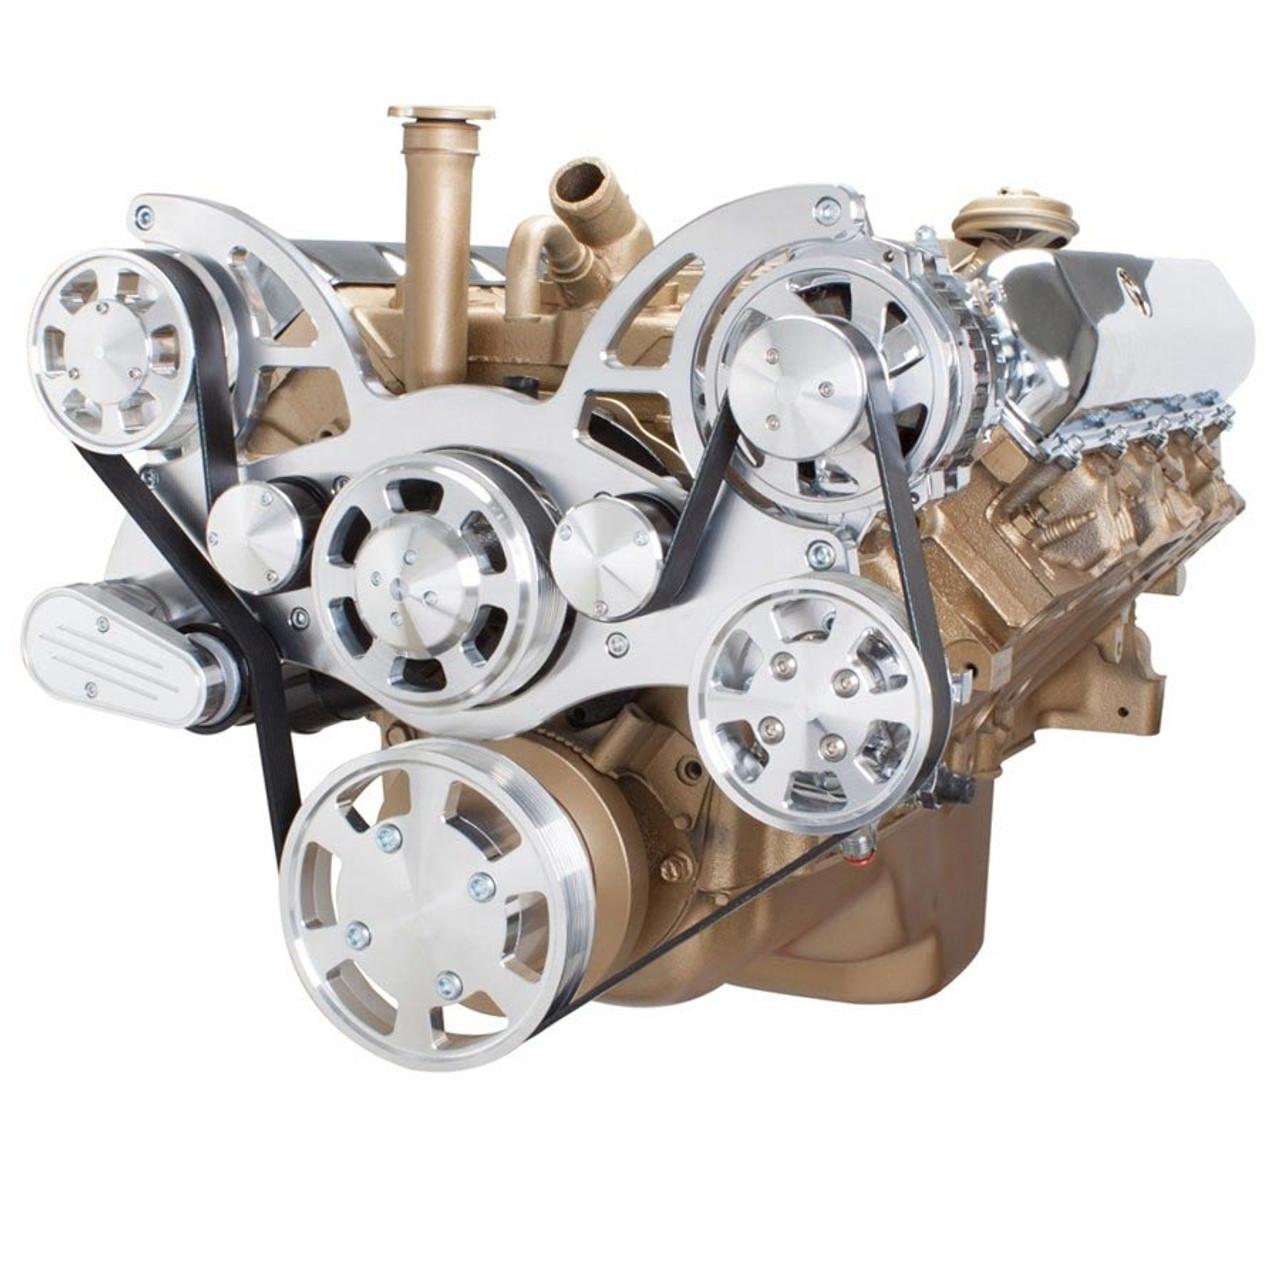 serpentine system for oldsmobile 350 455 power steering alternator  [ 900 x 900 Pixel ]